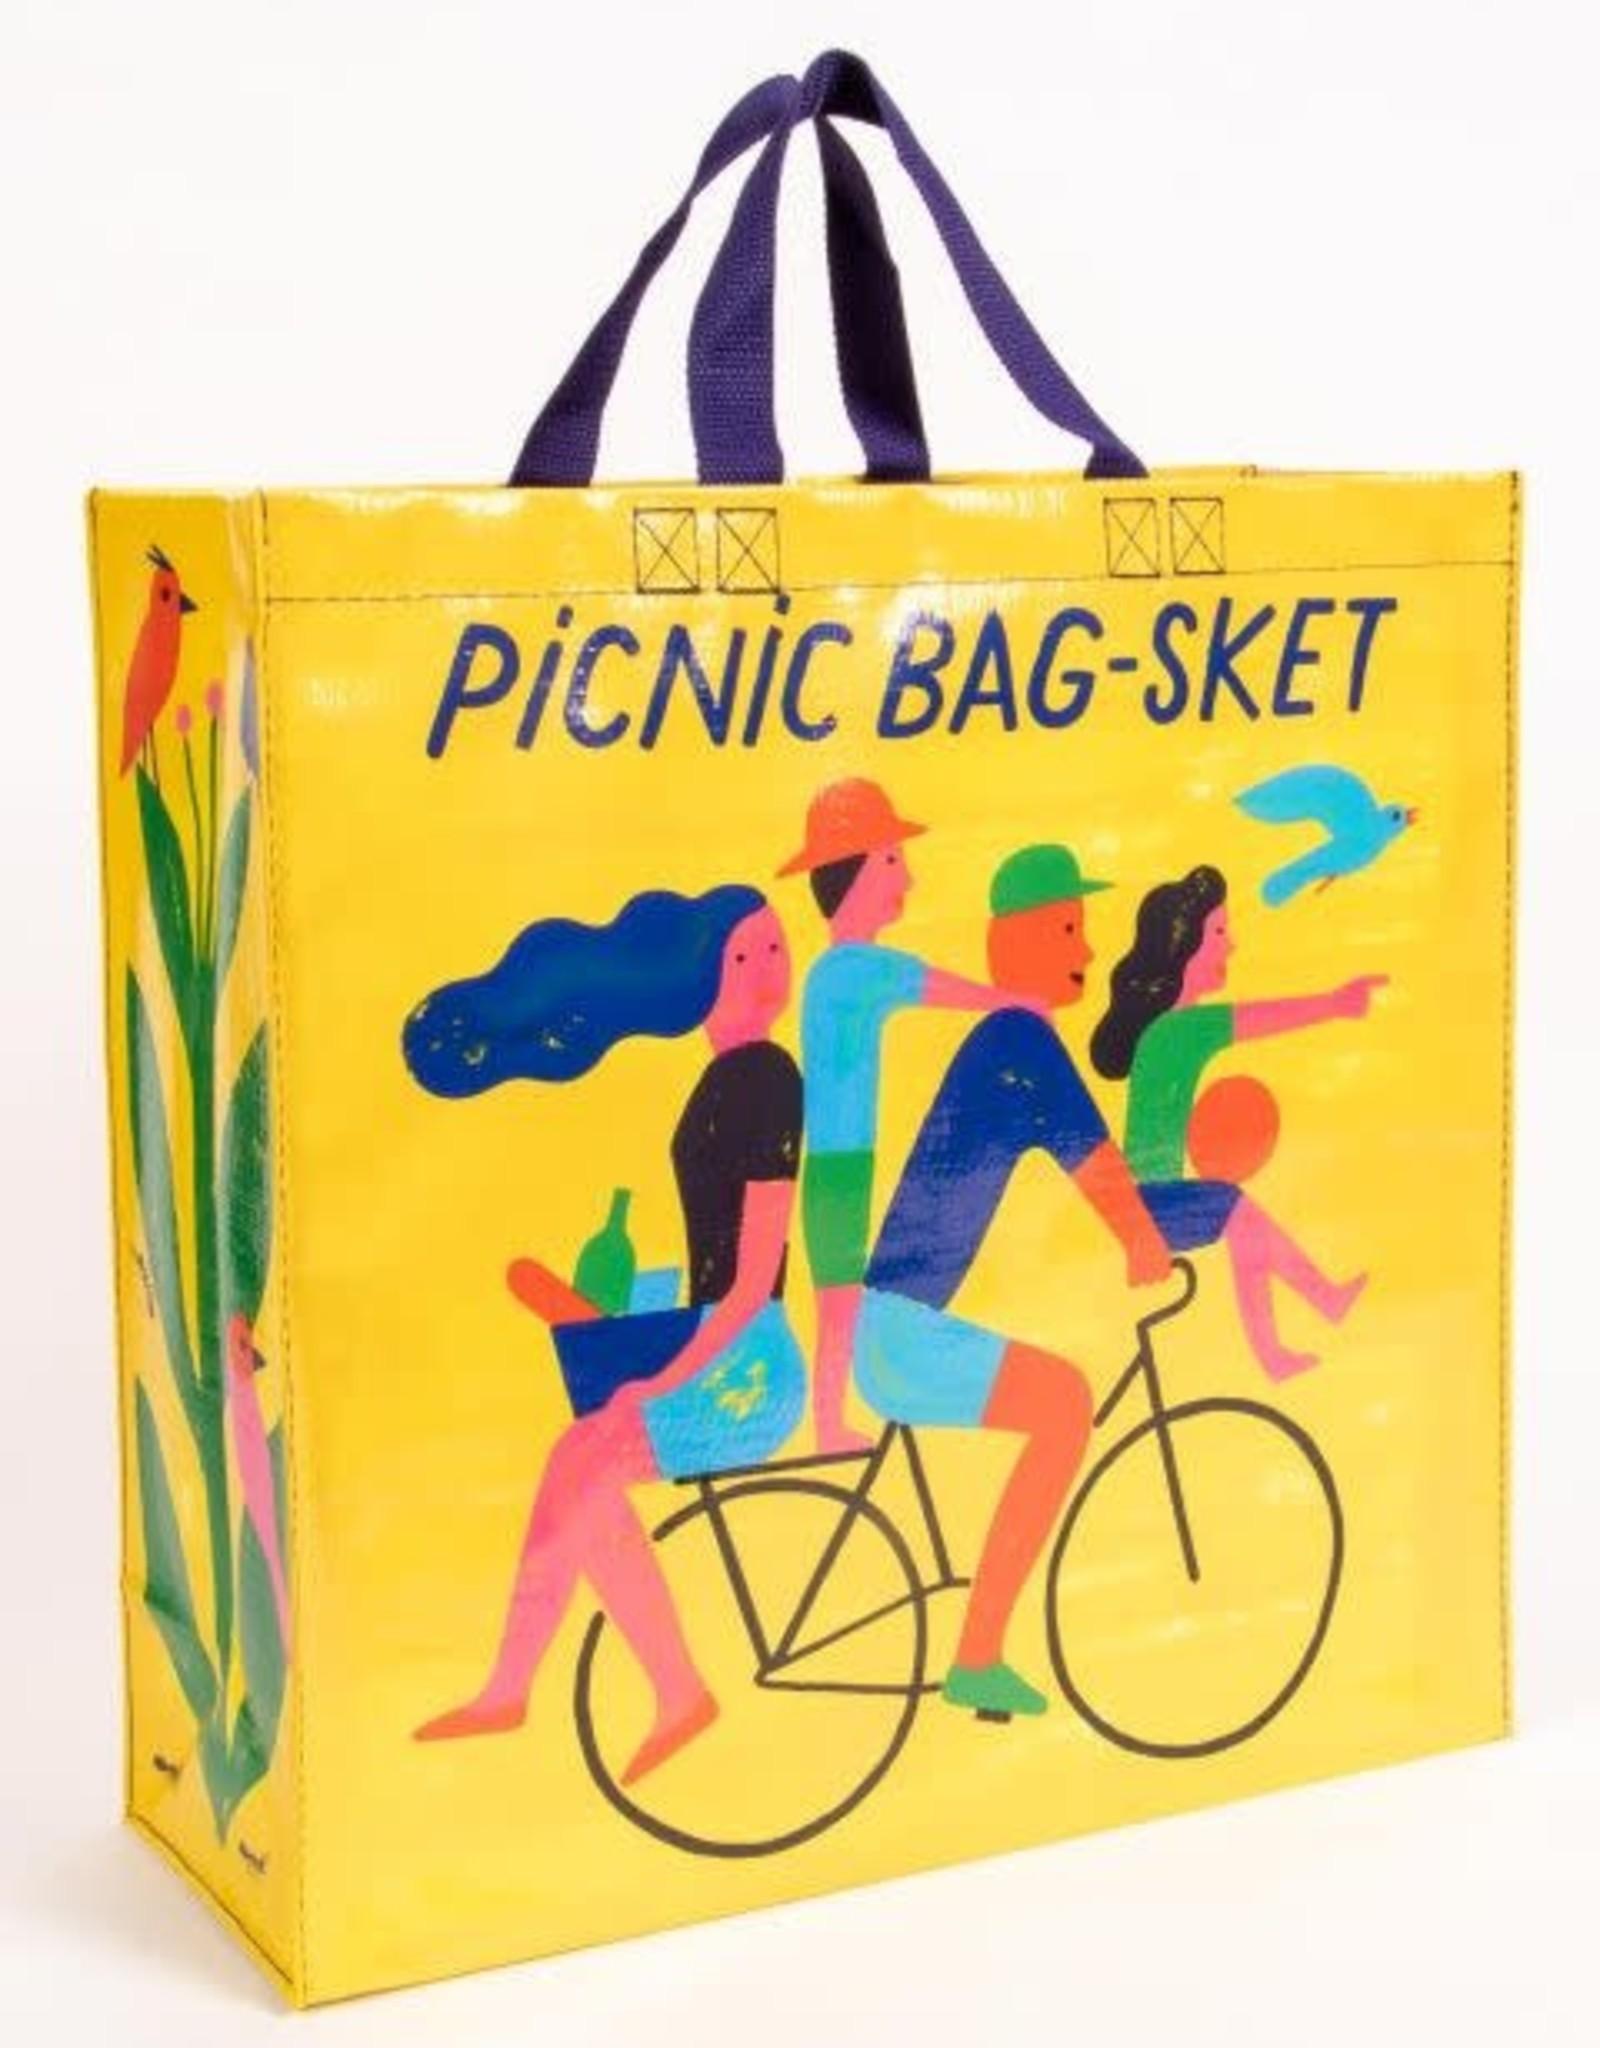 Picnic Bag-sket Shopper